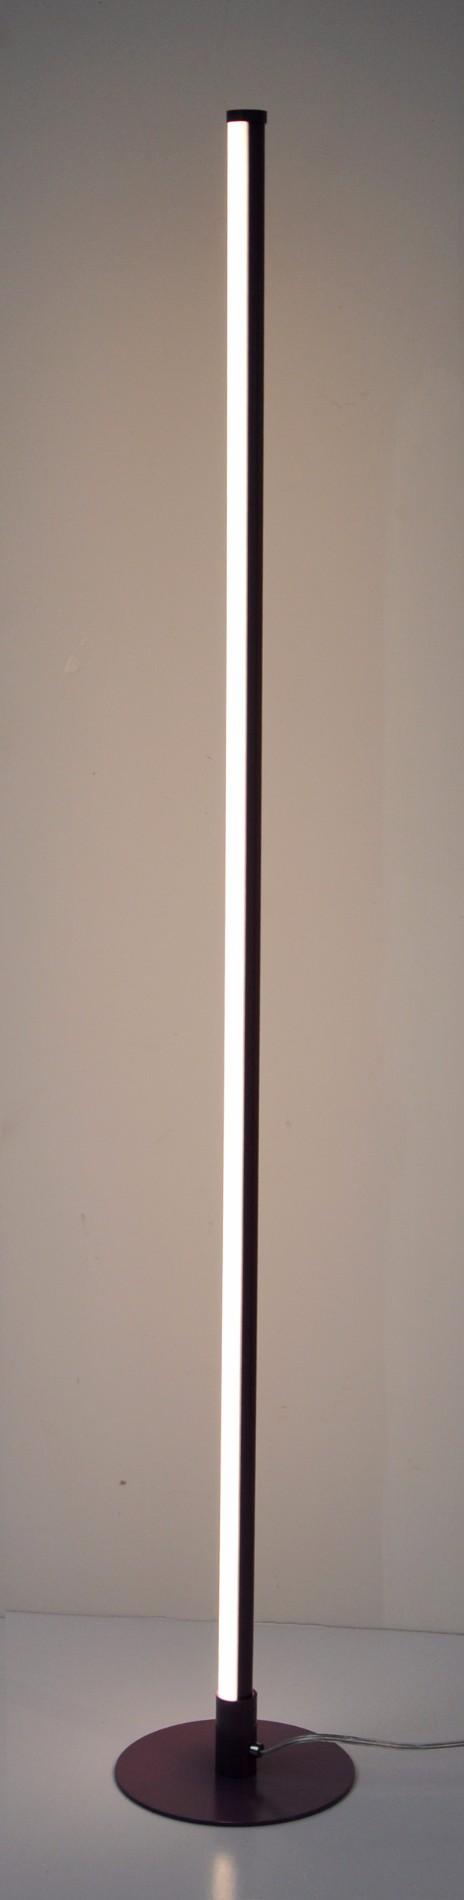 Contemporary Black Floor Lamp